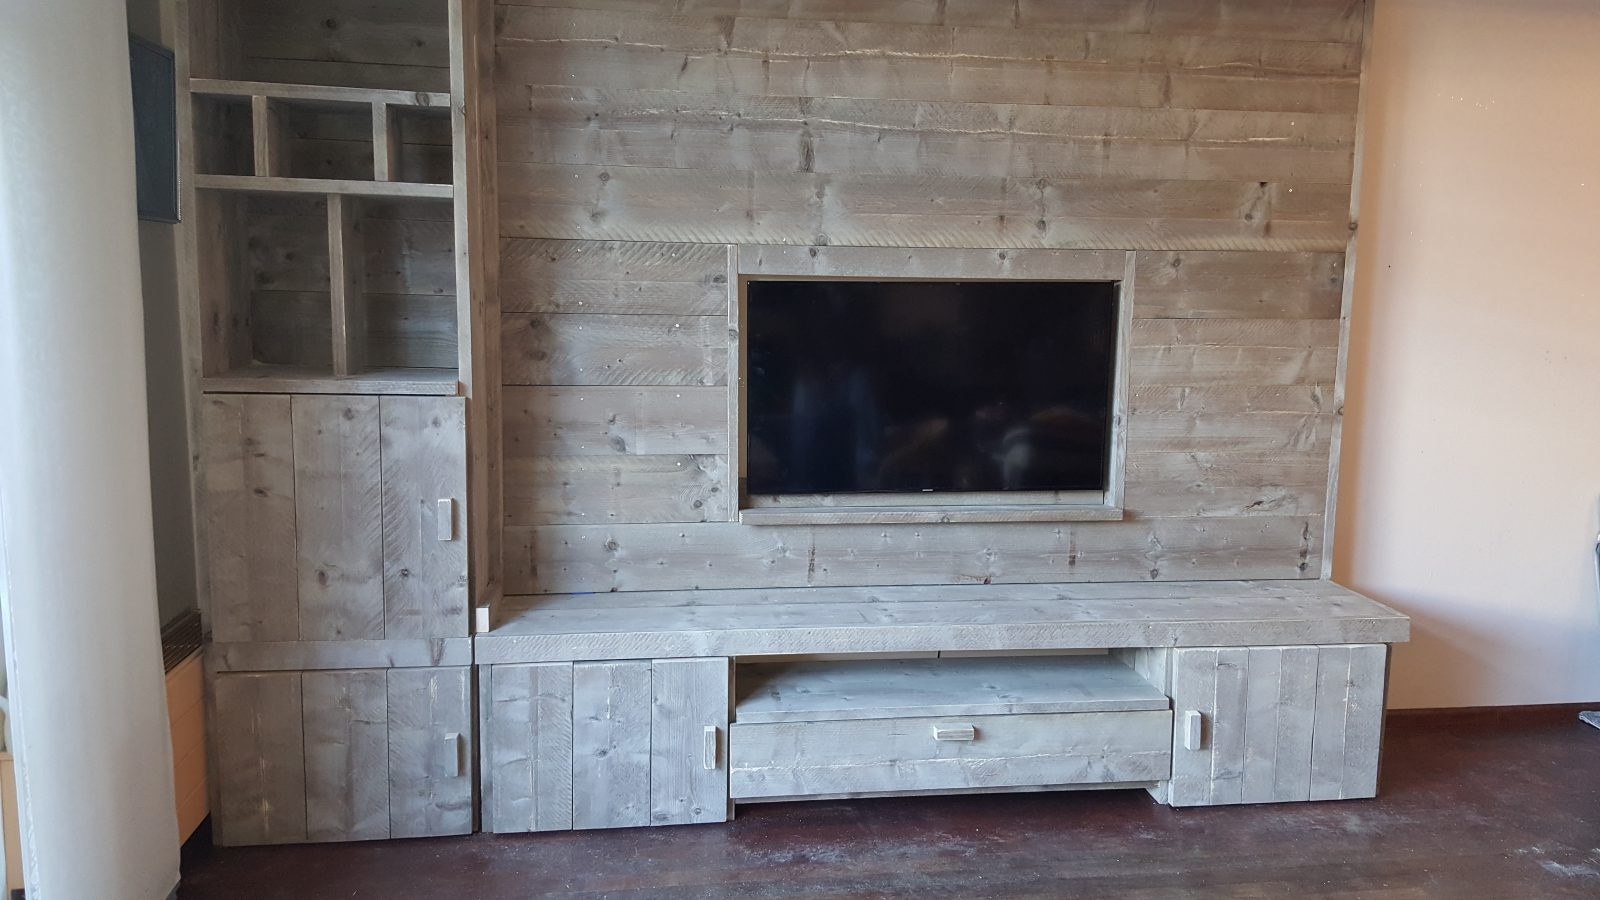 Steigerhout Tv Kast : Tv kast ingebouwd in achterwand rb houtwerk